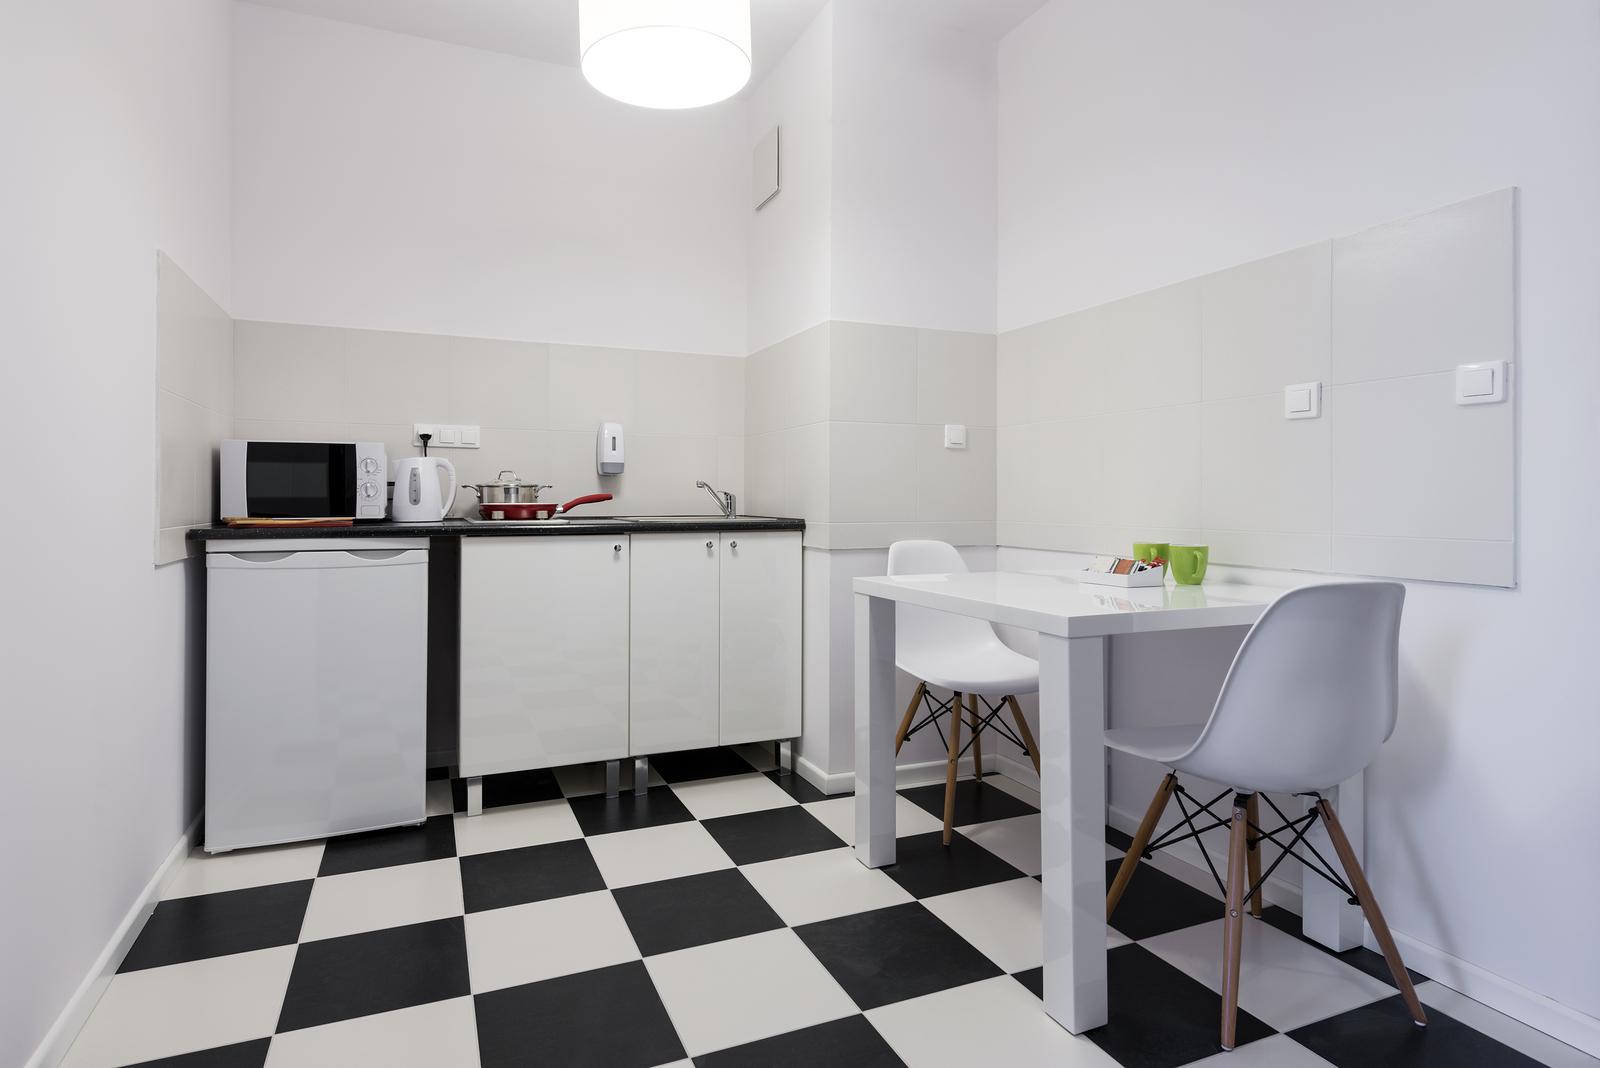 White and black small and compact kitchen interior design